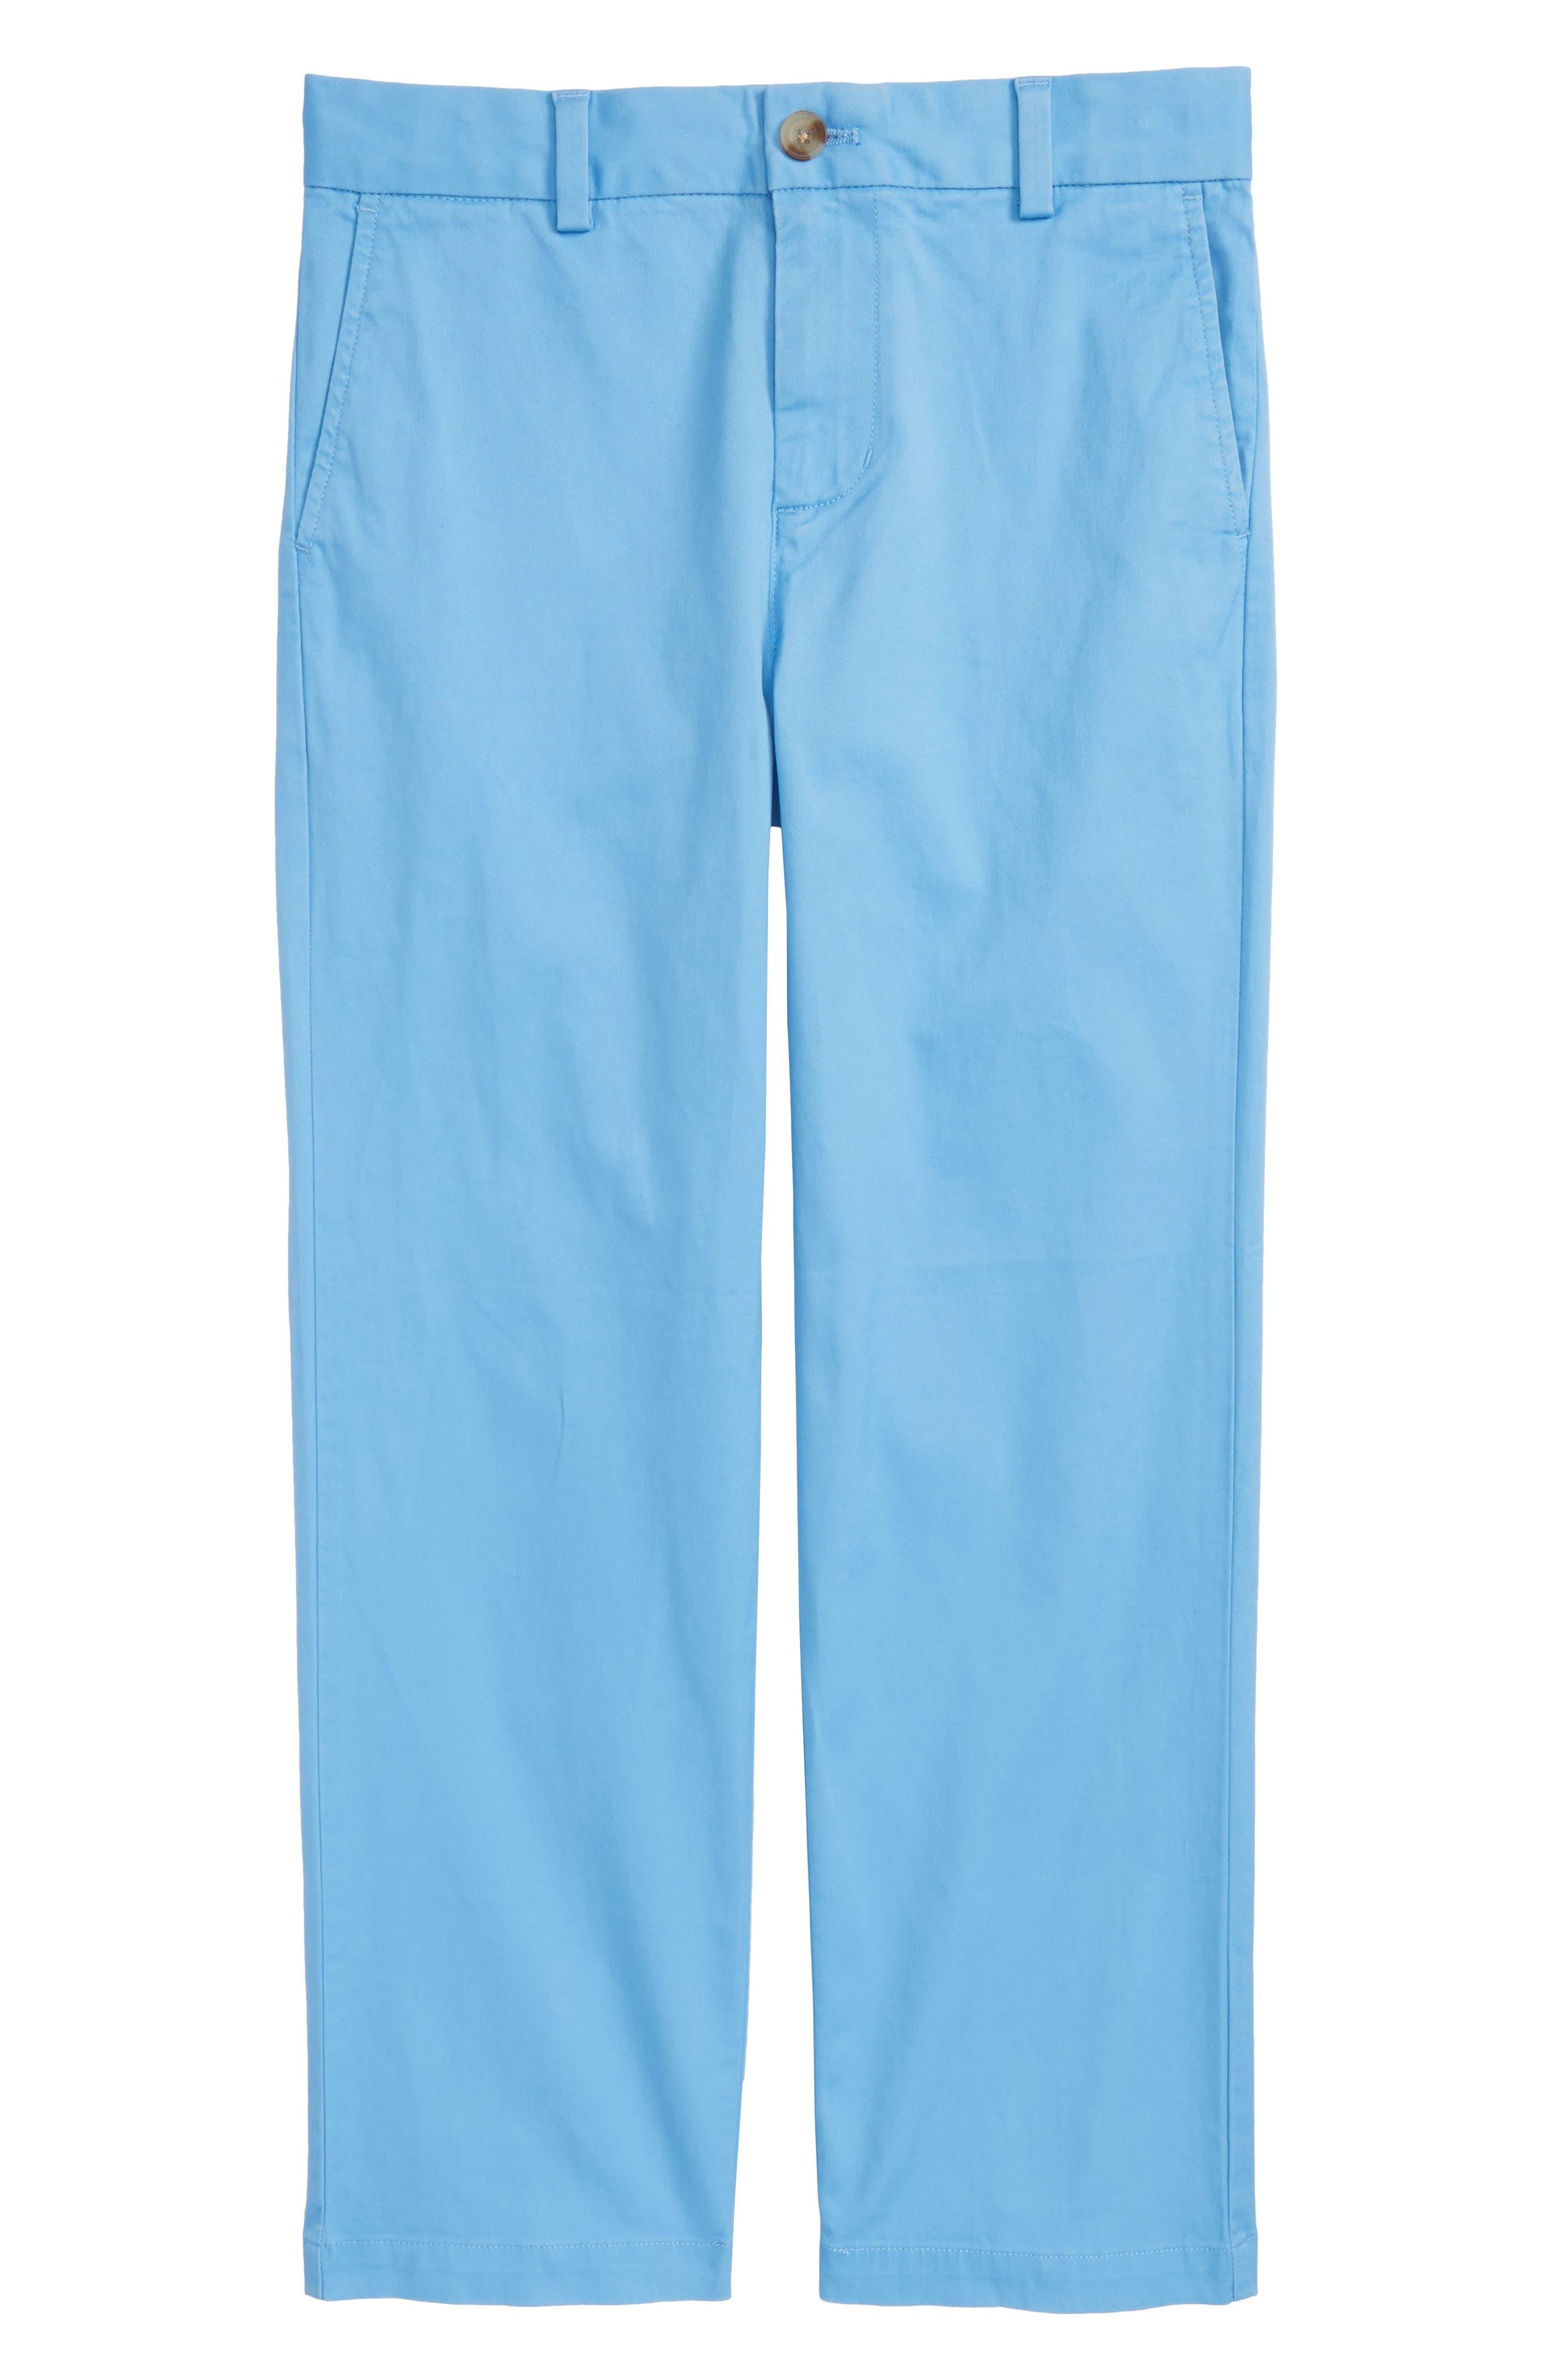 Breaker Pants,                         Main,                         color, DOCKSIDE BLUE